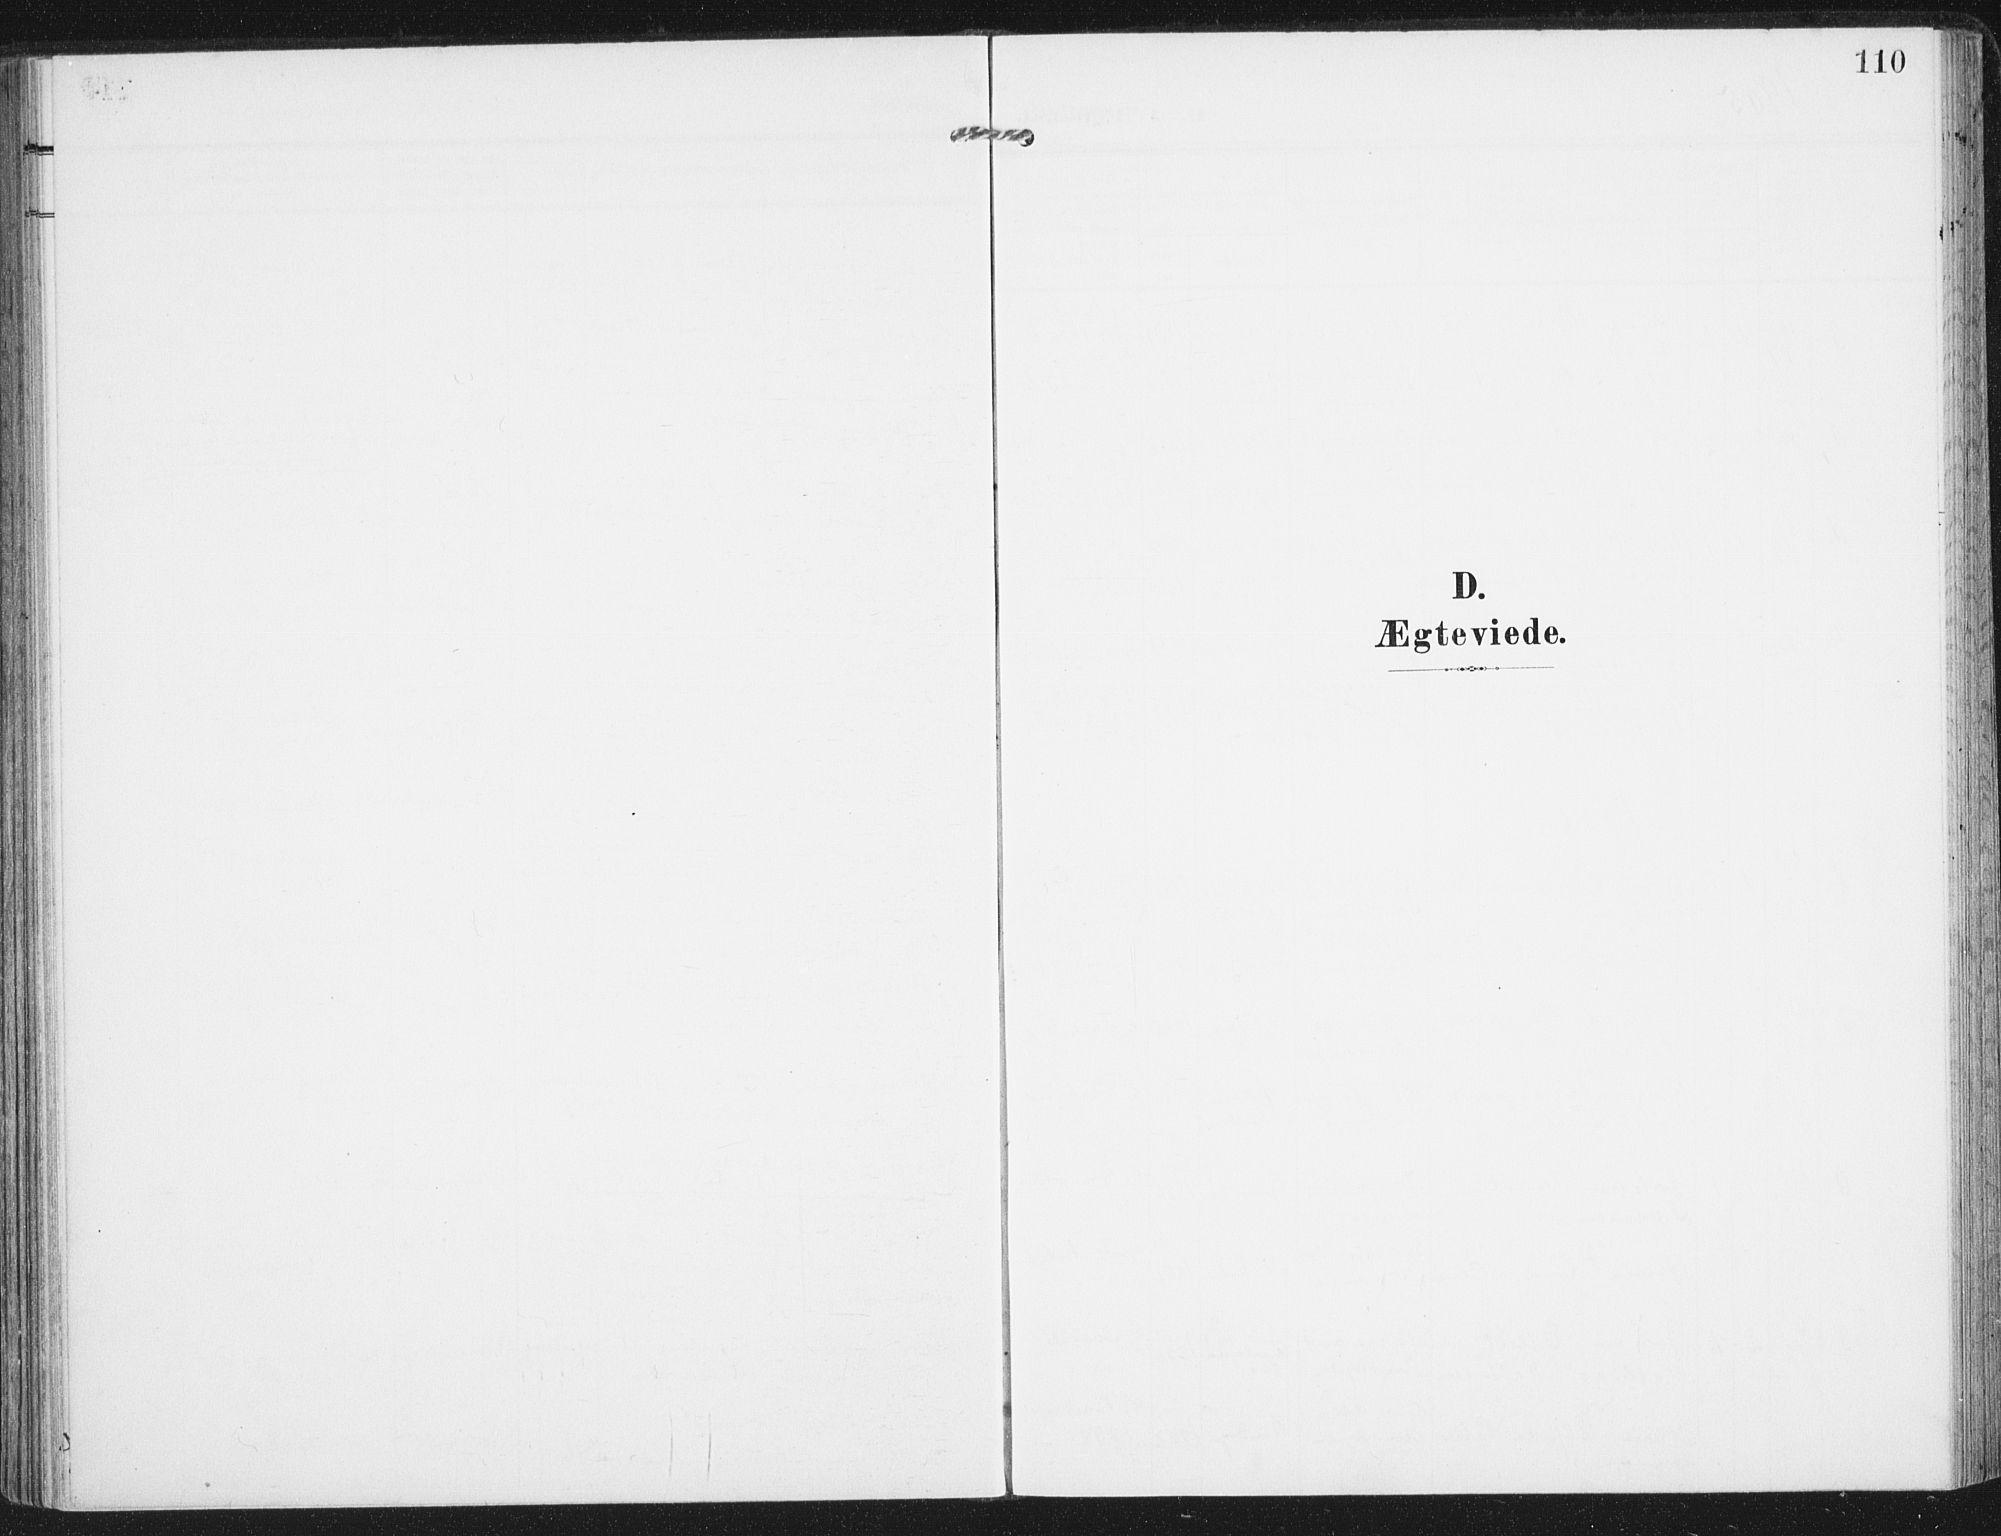 SAT, Ministerialprotokoller, klokkerbøker og fødselsregistre - Nordland, 885/L1206: Ministerialbok nr. 885A07, 1905-1915, s. 110